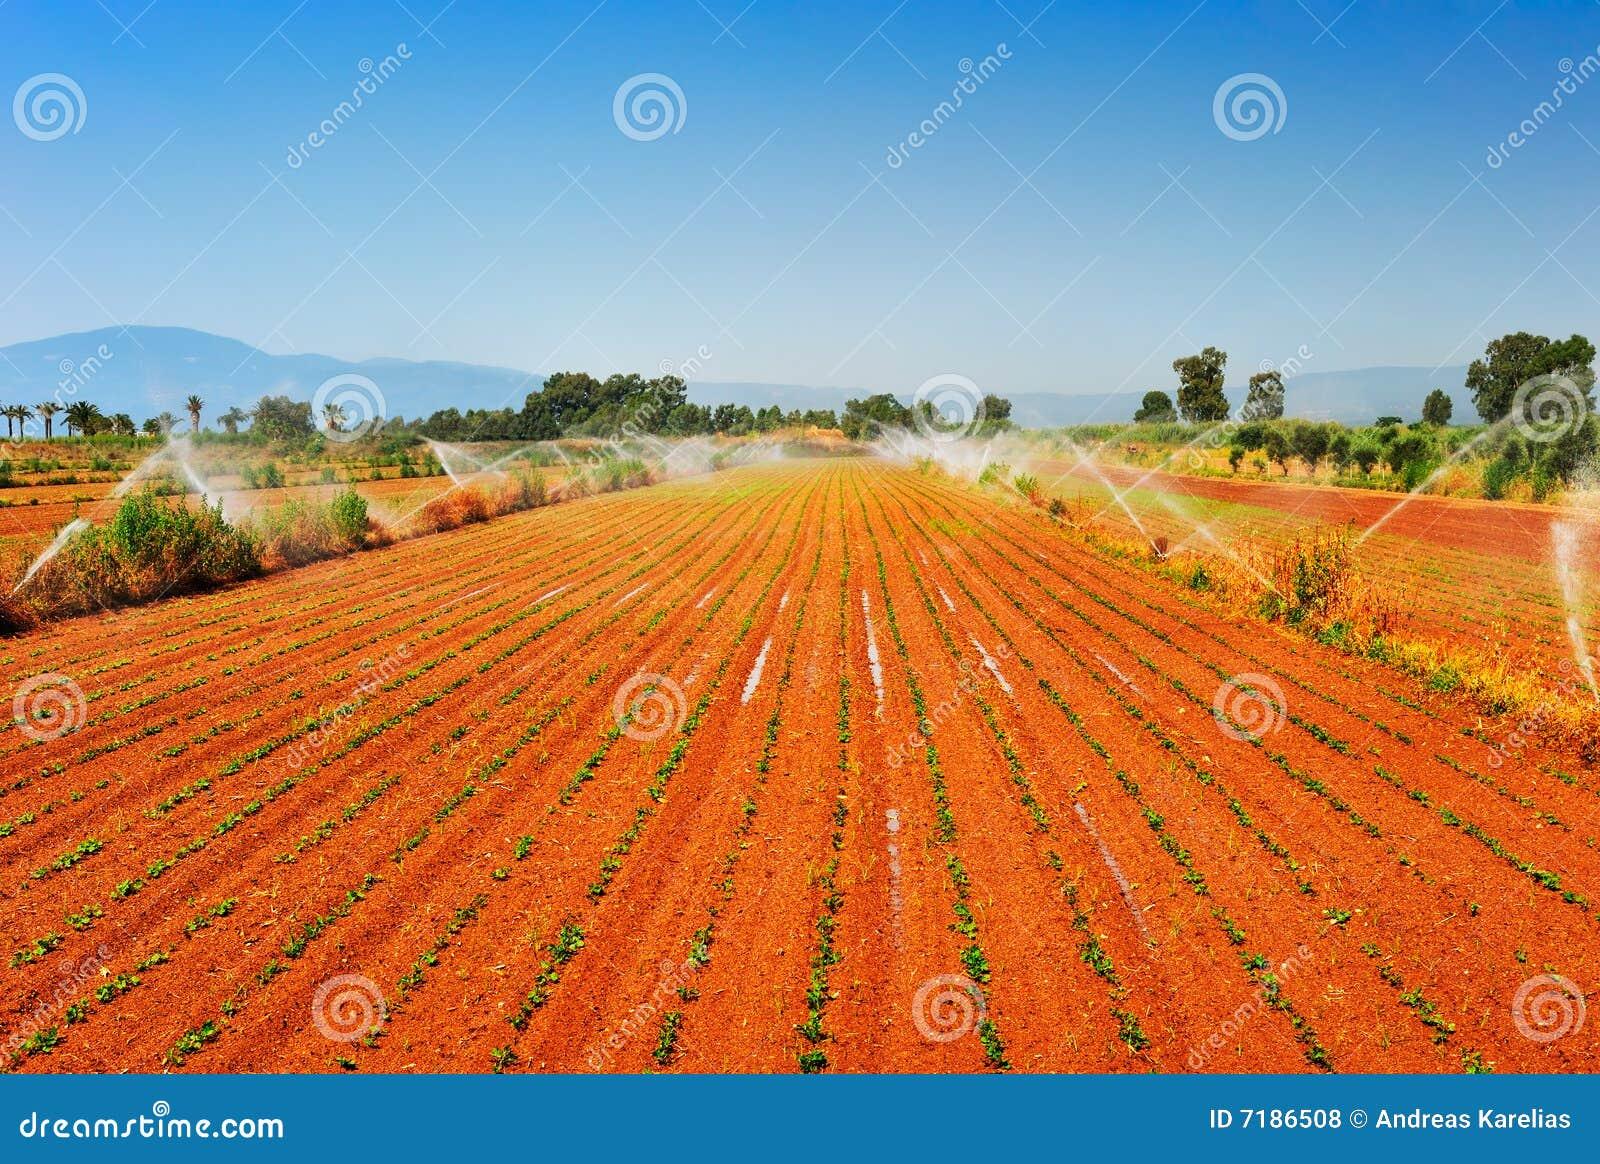 Irrigated farm